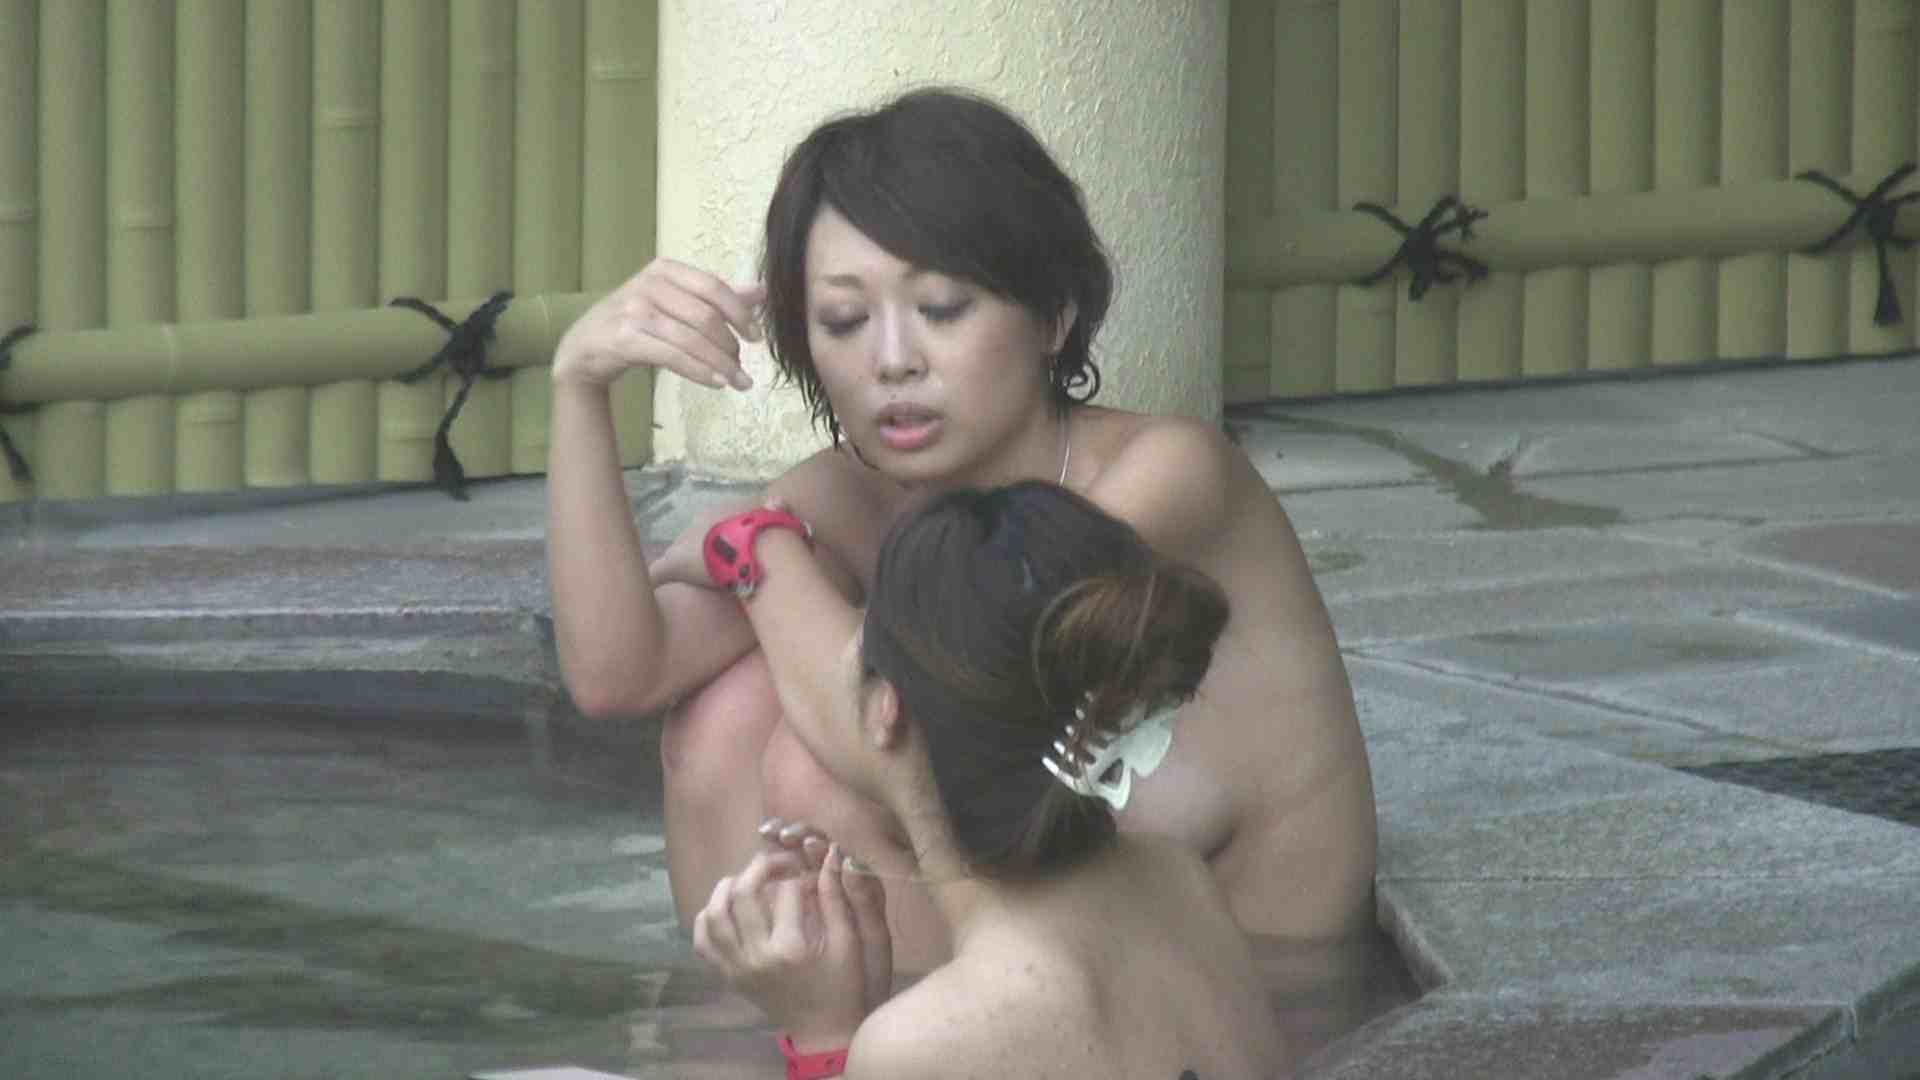 Aquaな露天風呂Vol.201 OLのエロ生活 | 露天風呂  96連発 55